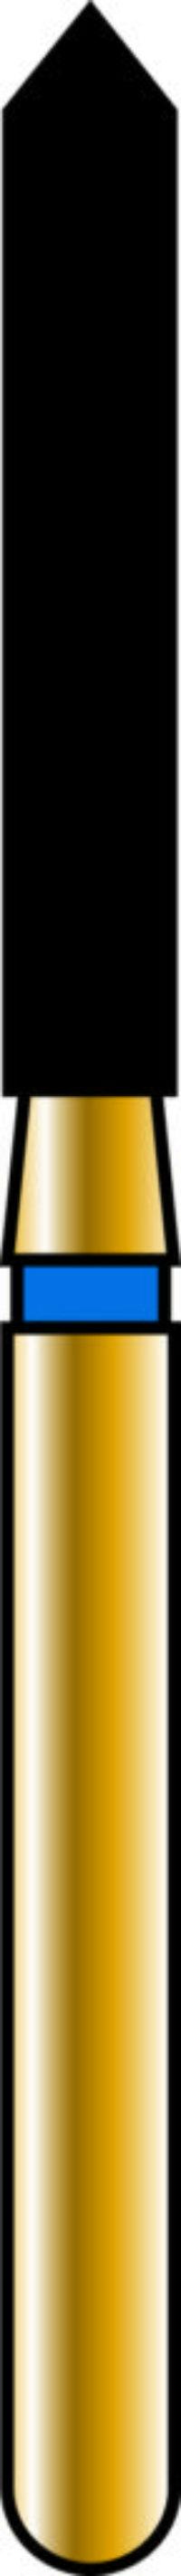 Pointed Cylinder 16-10mm Gold Diamond Bur